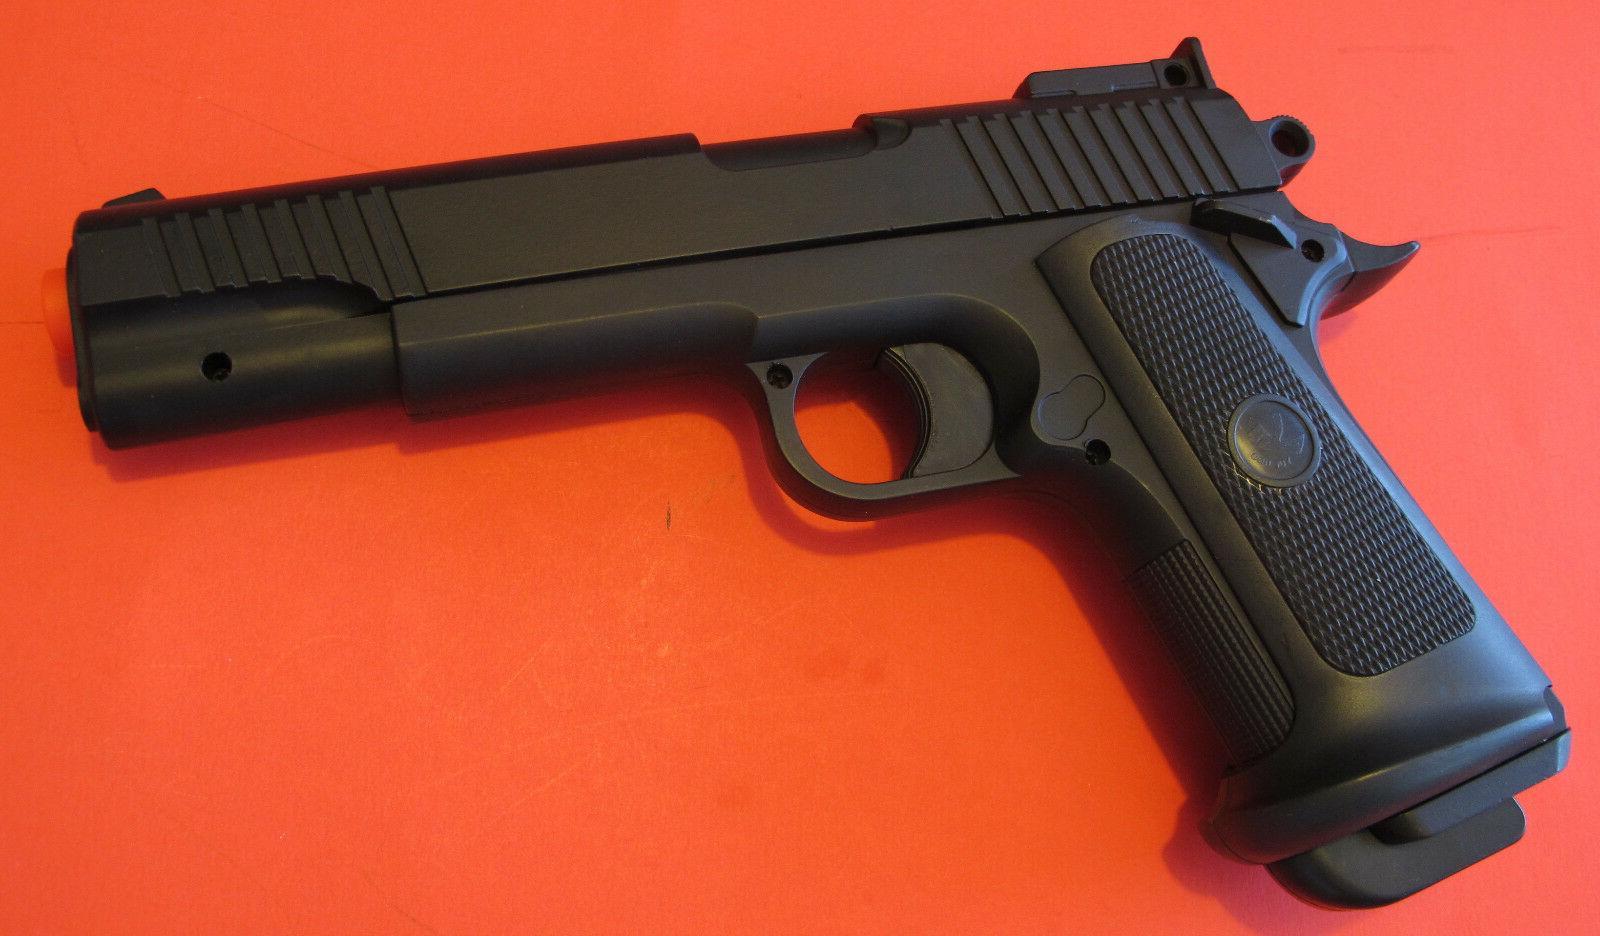 Full Metal Body, Metal Slide Airsoft Spring Pistol P911 Shoo